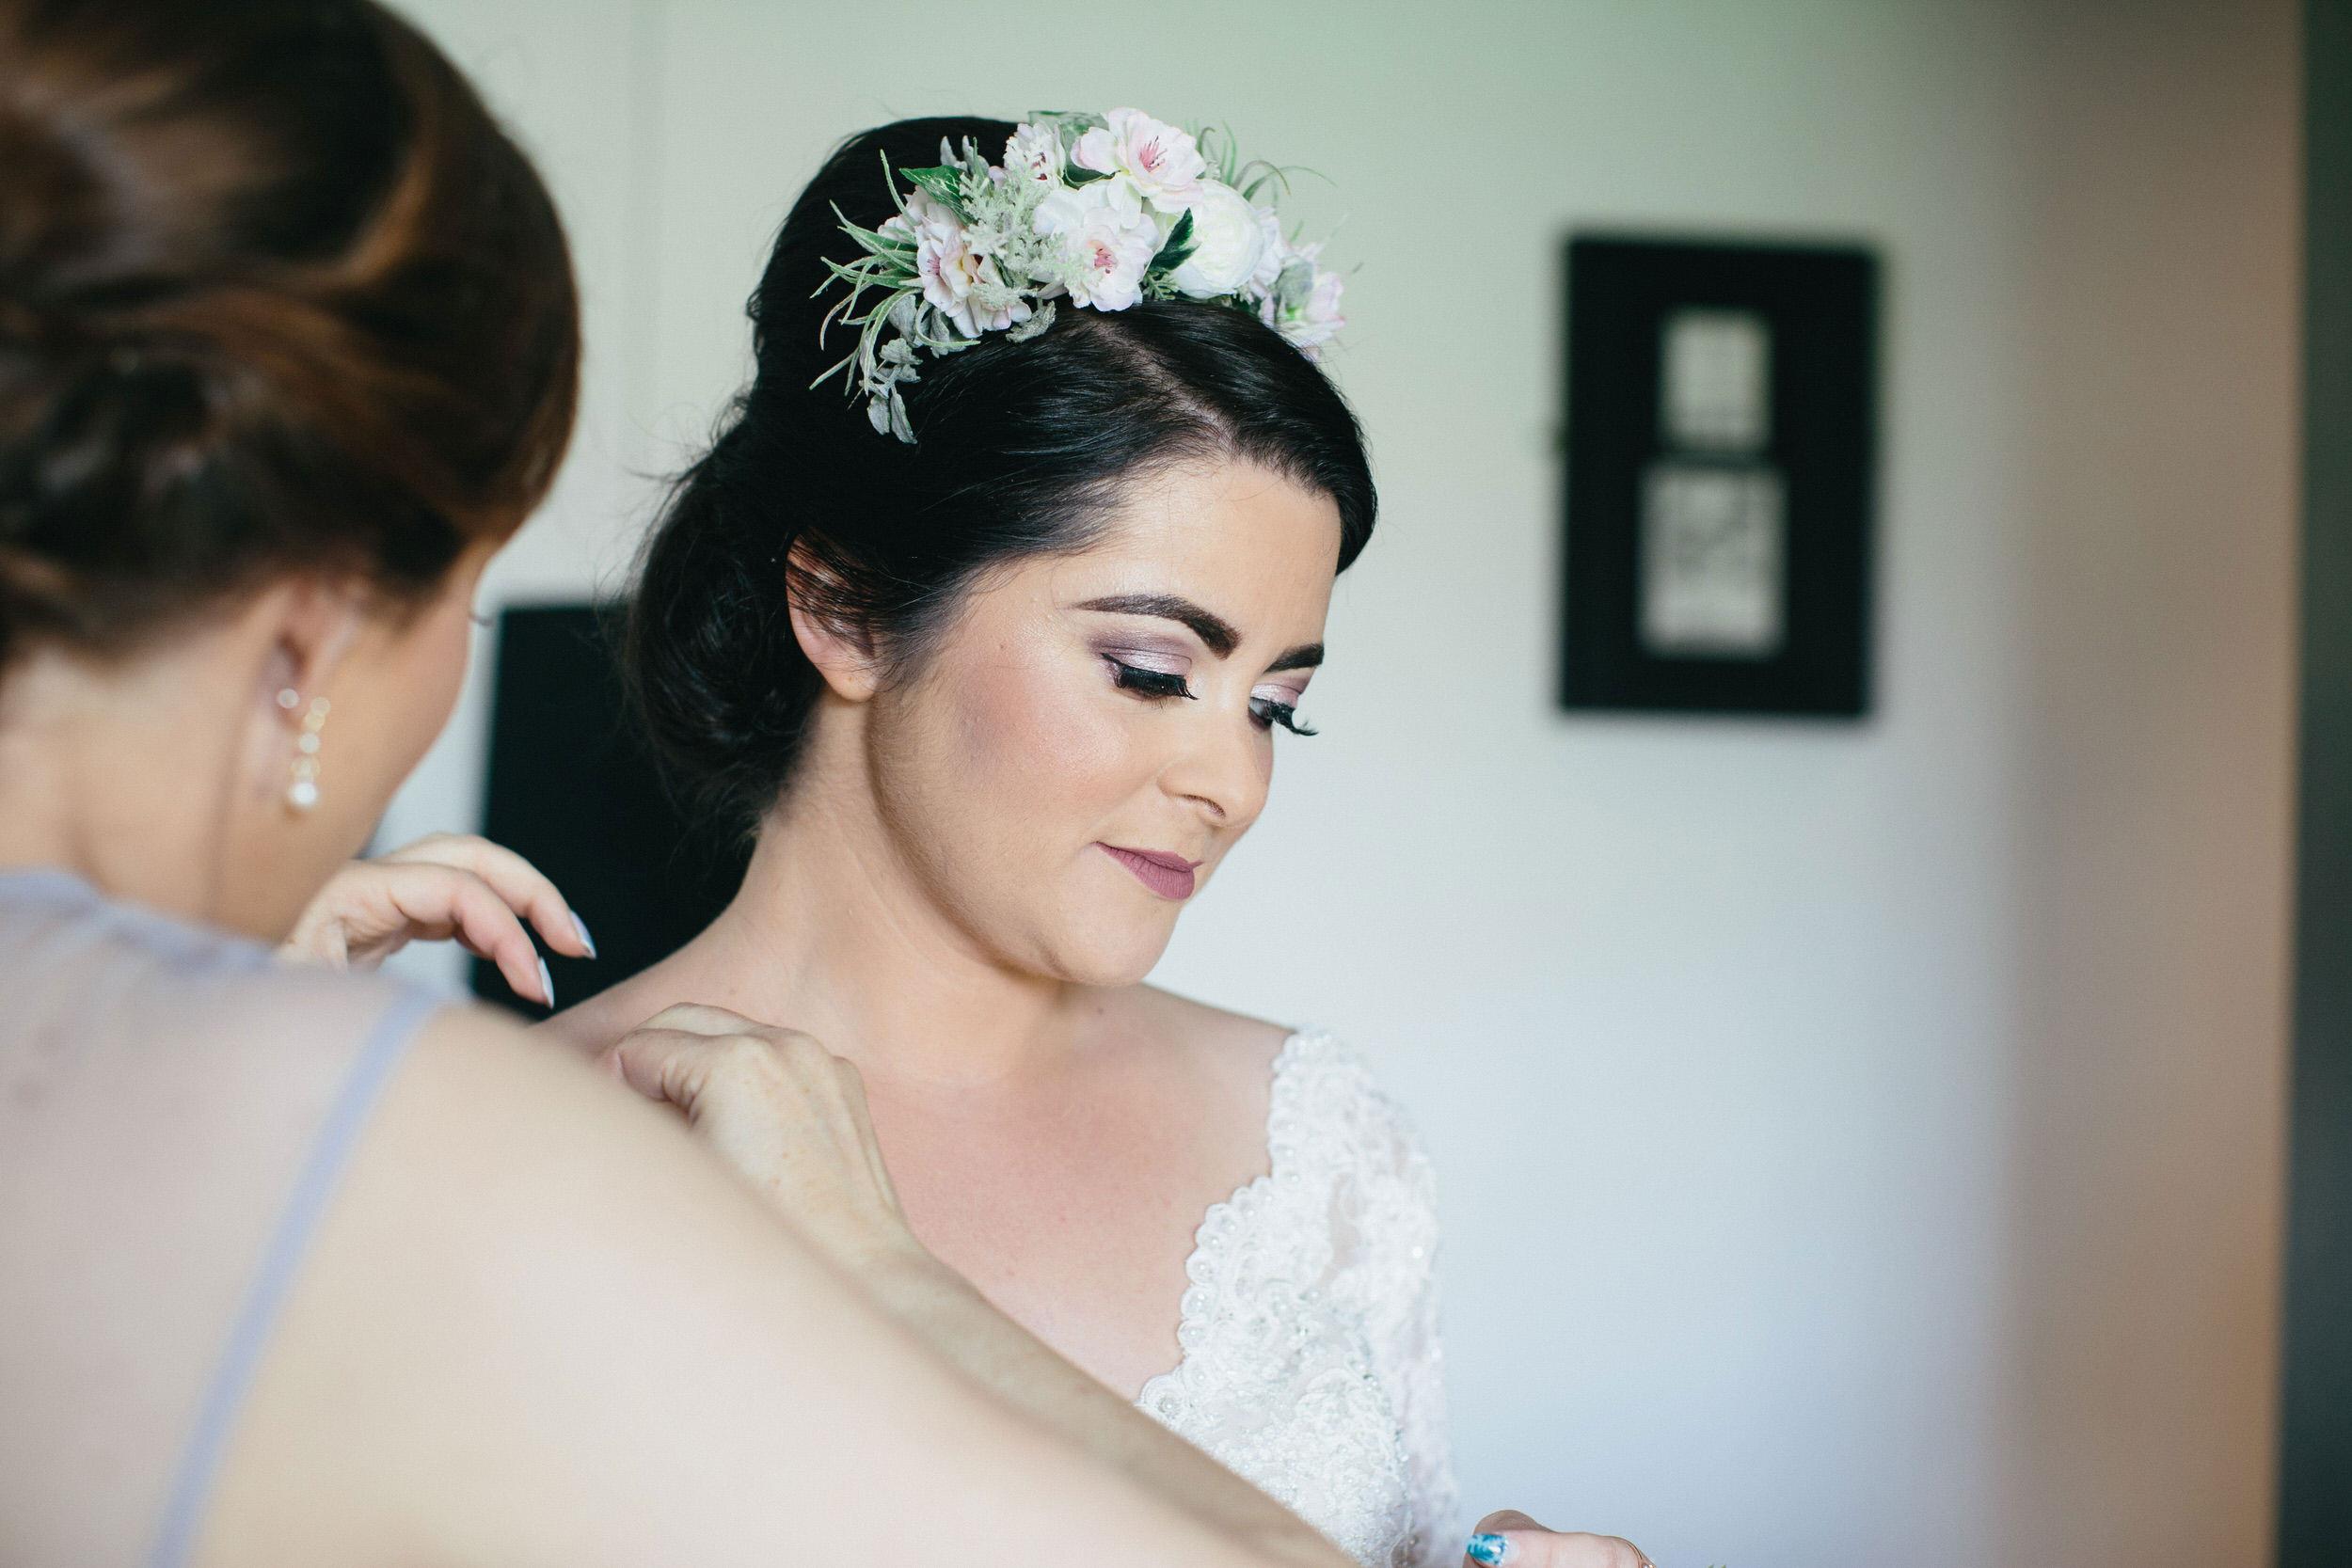 Quirky Wedding Photographer Scotland Glasgow Edinburgh Mirrorbox 054.jpg